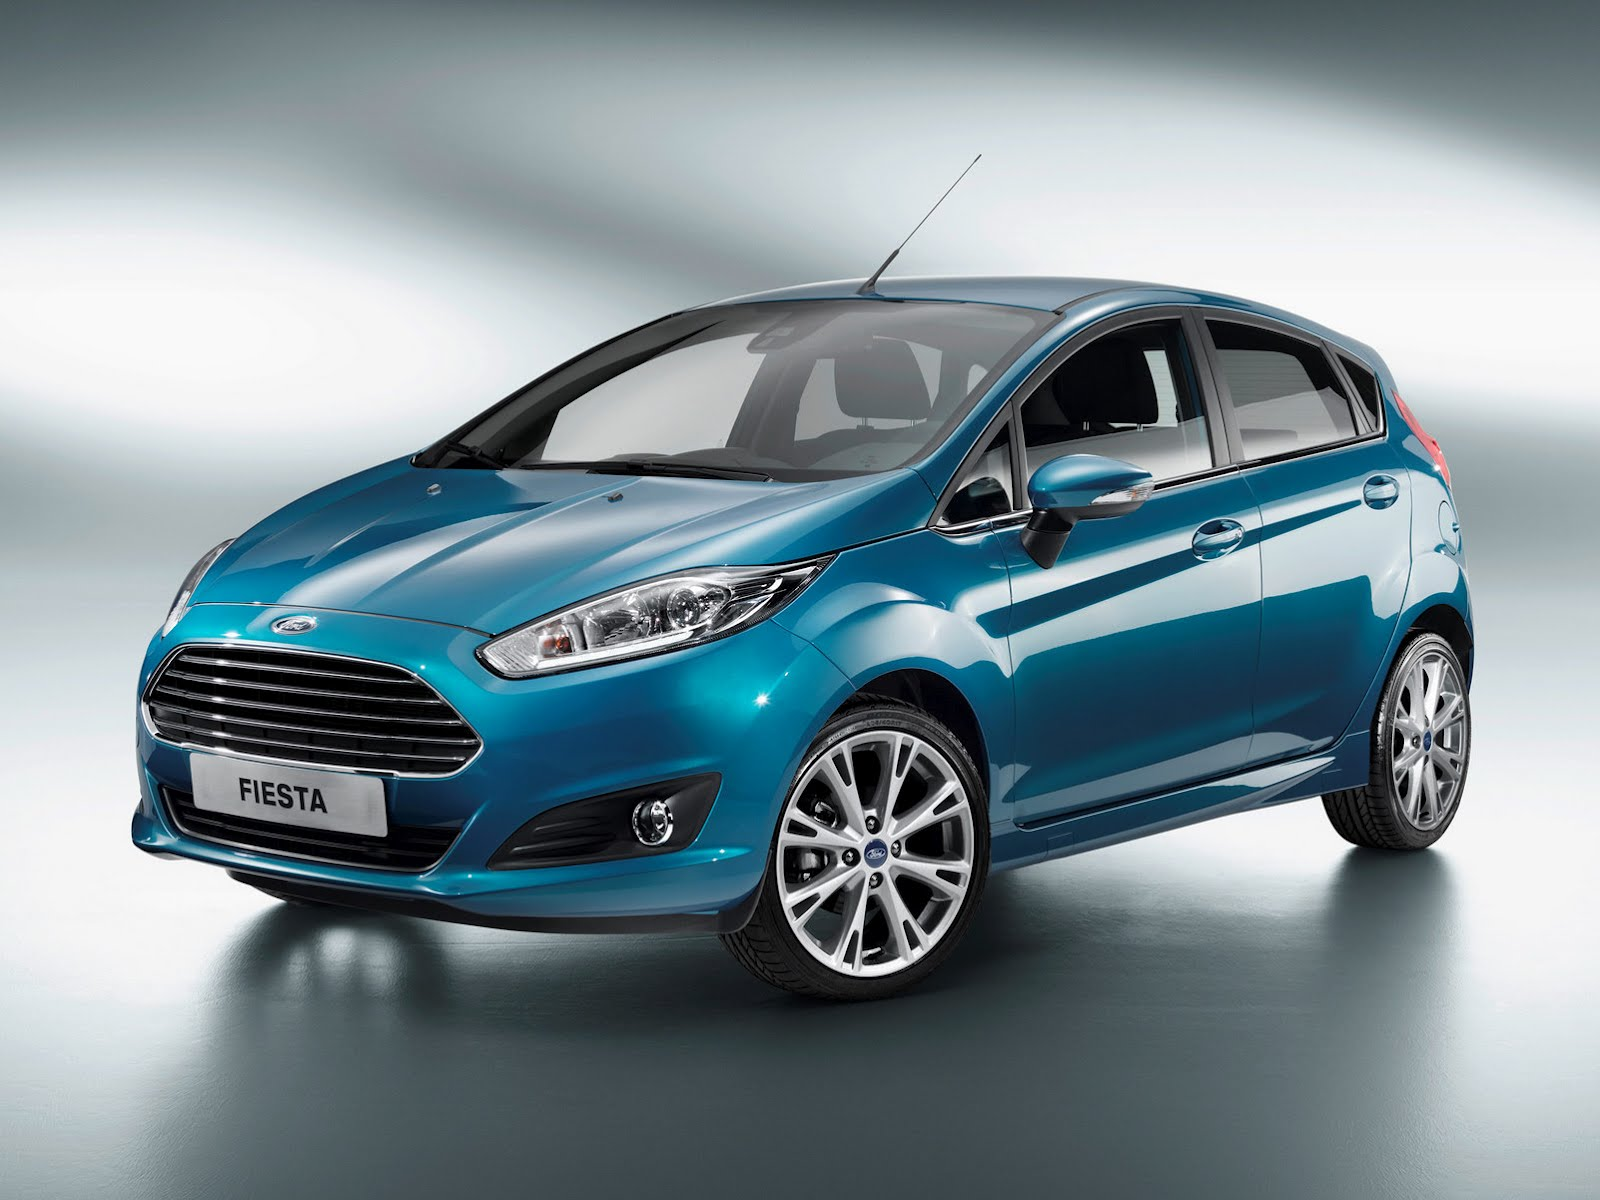 2013 Ford Fiesta Facelift ... & New Ford Fiesta Makes Video Debut - autoevolution markmcfarlin.com